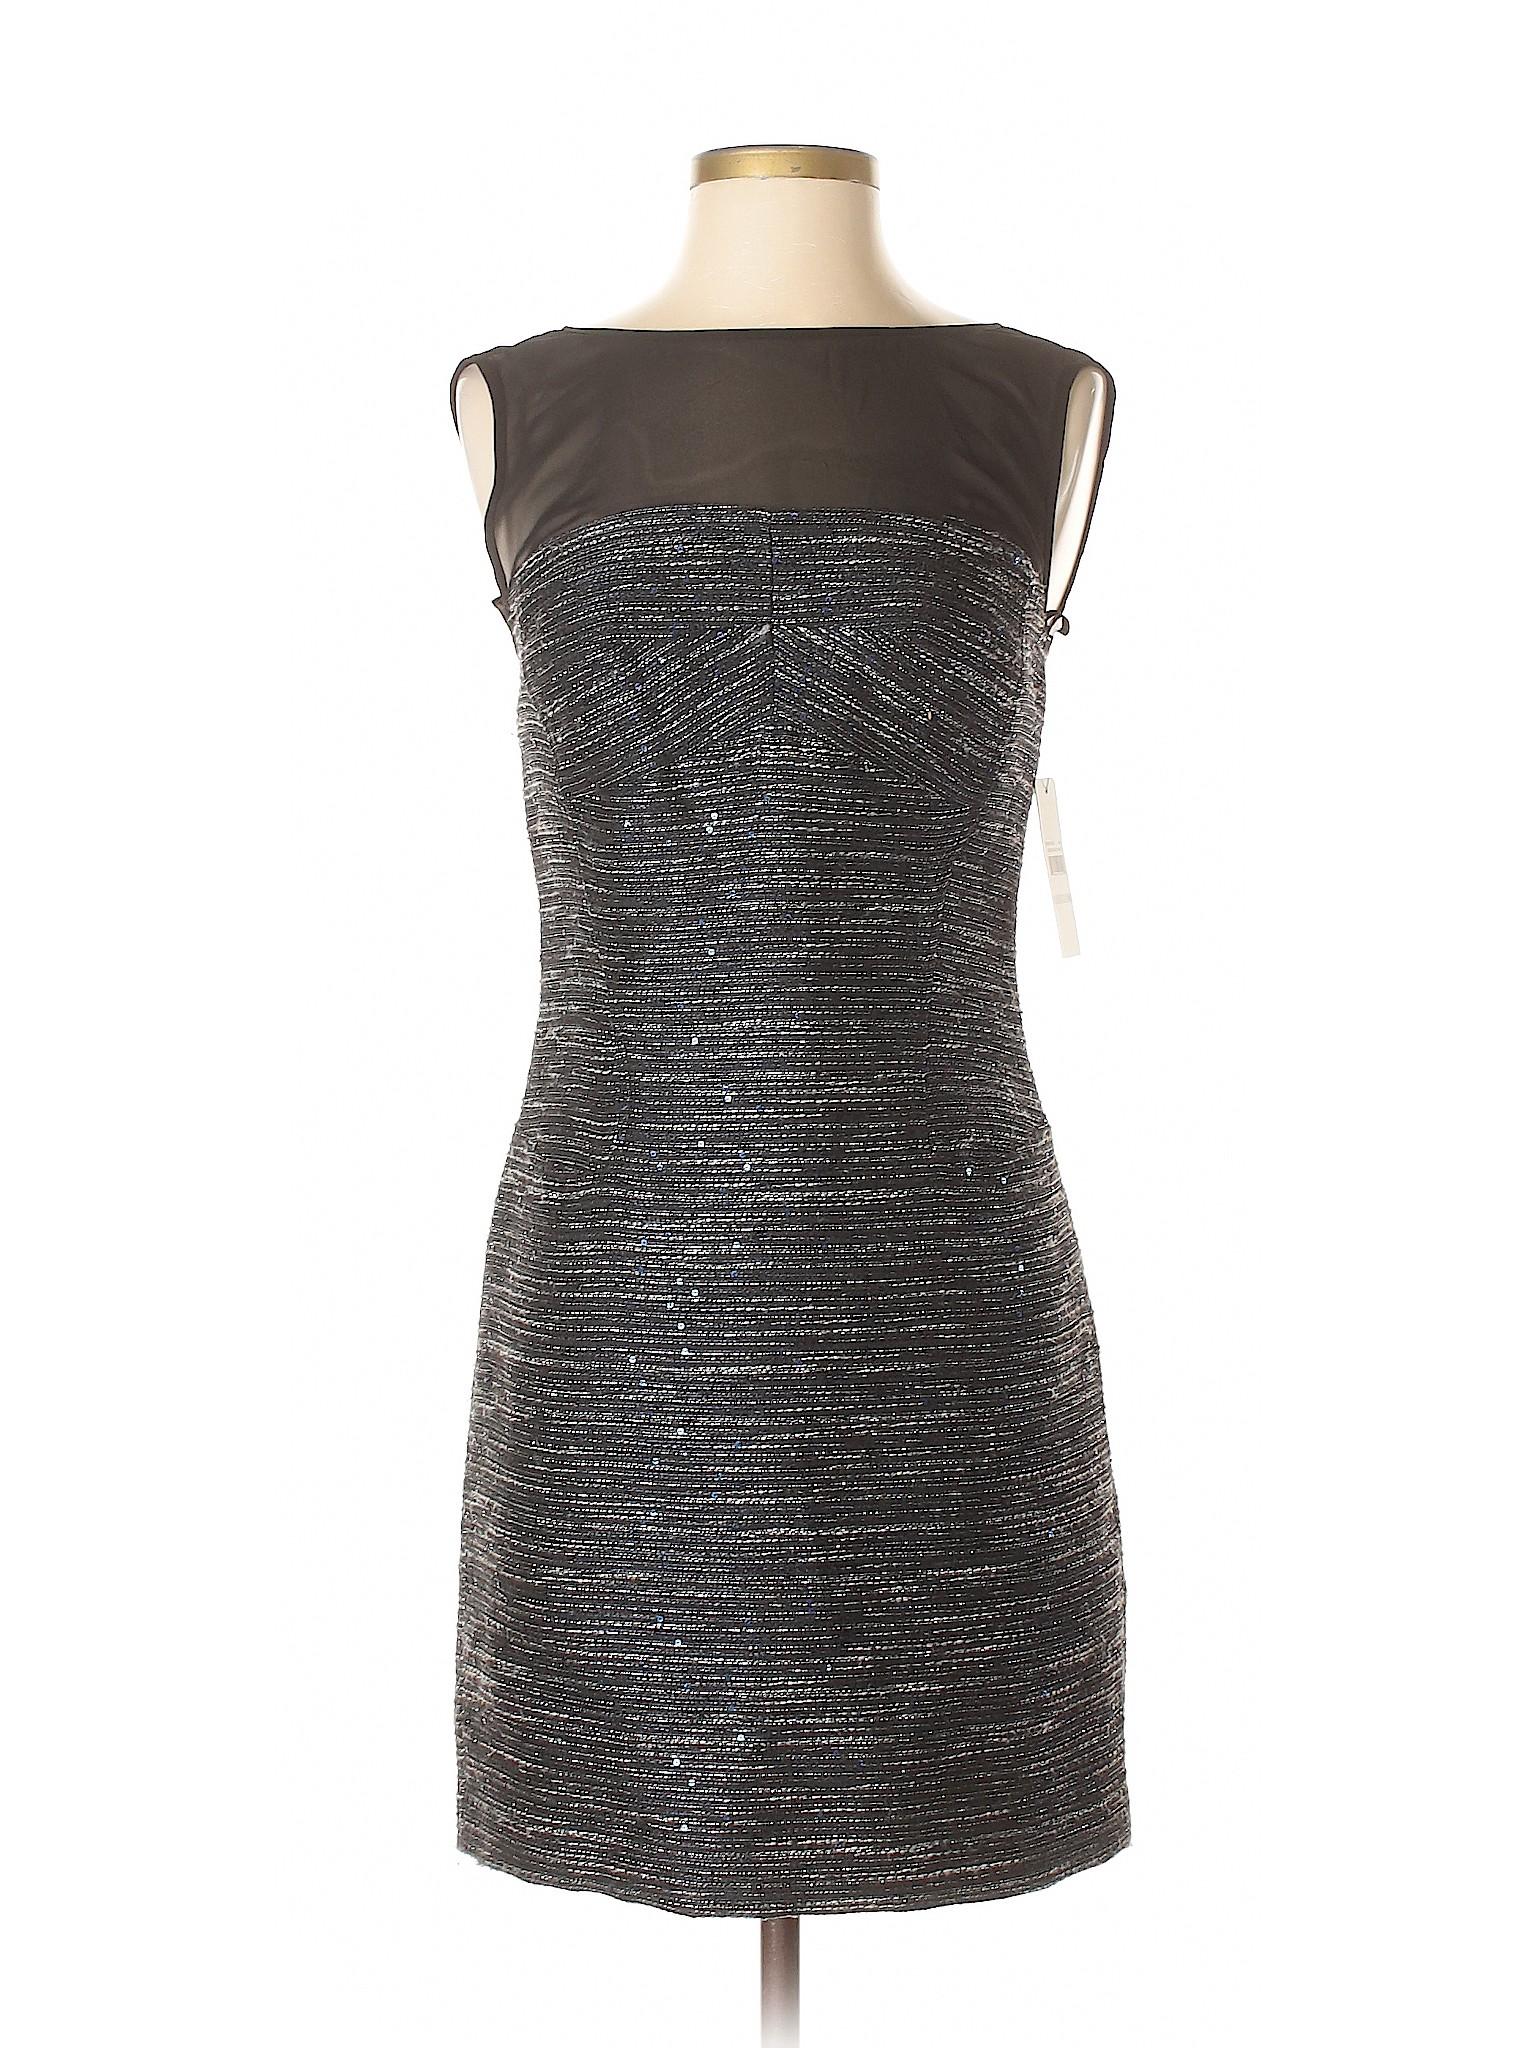 Dress winter Shelli by Segal Cocktail Laundry Boutique YqFSnPP